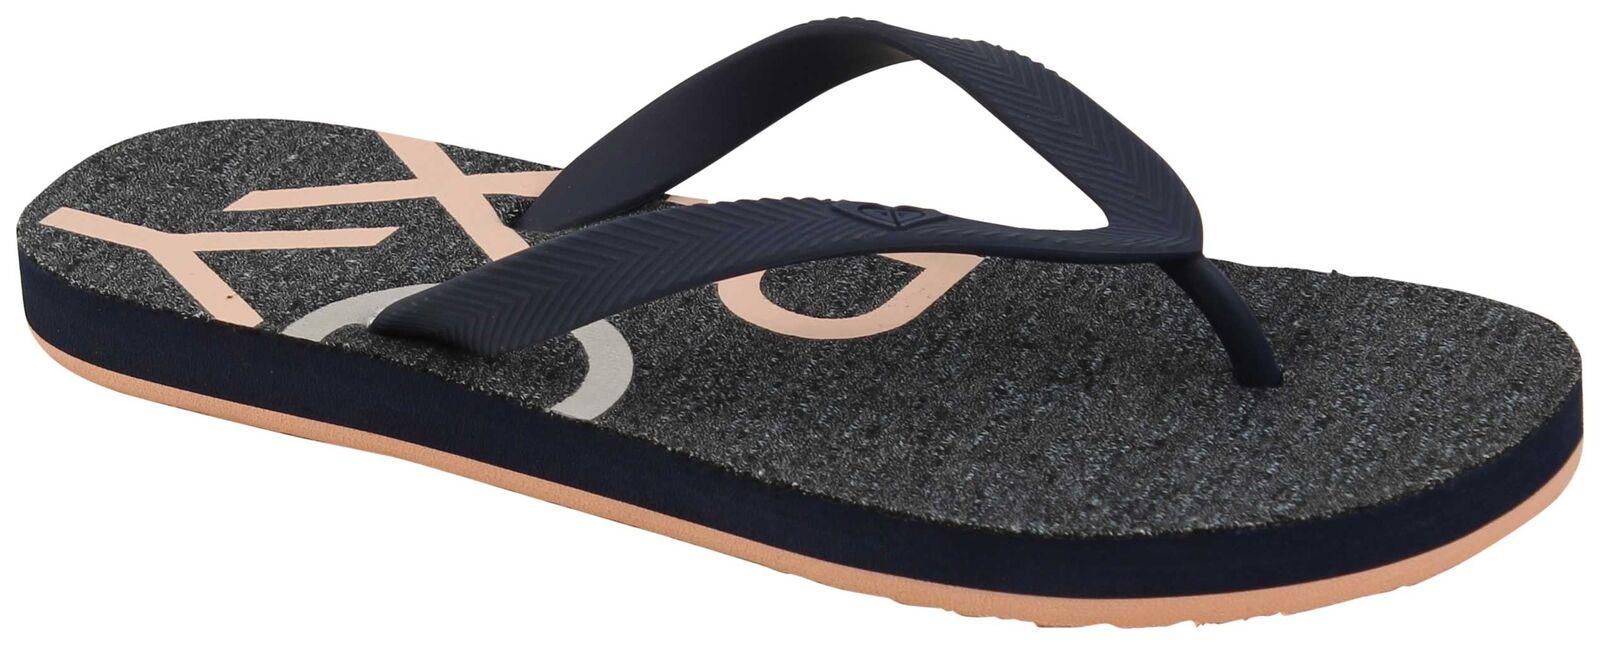 Sanuk 7552 Womens Yoga Chakra Beige Slide Flip-Flops Sandals 9 Medium (B,M) BHFO